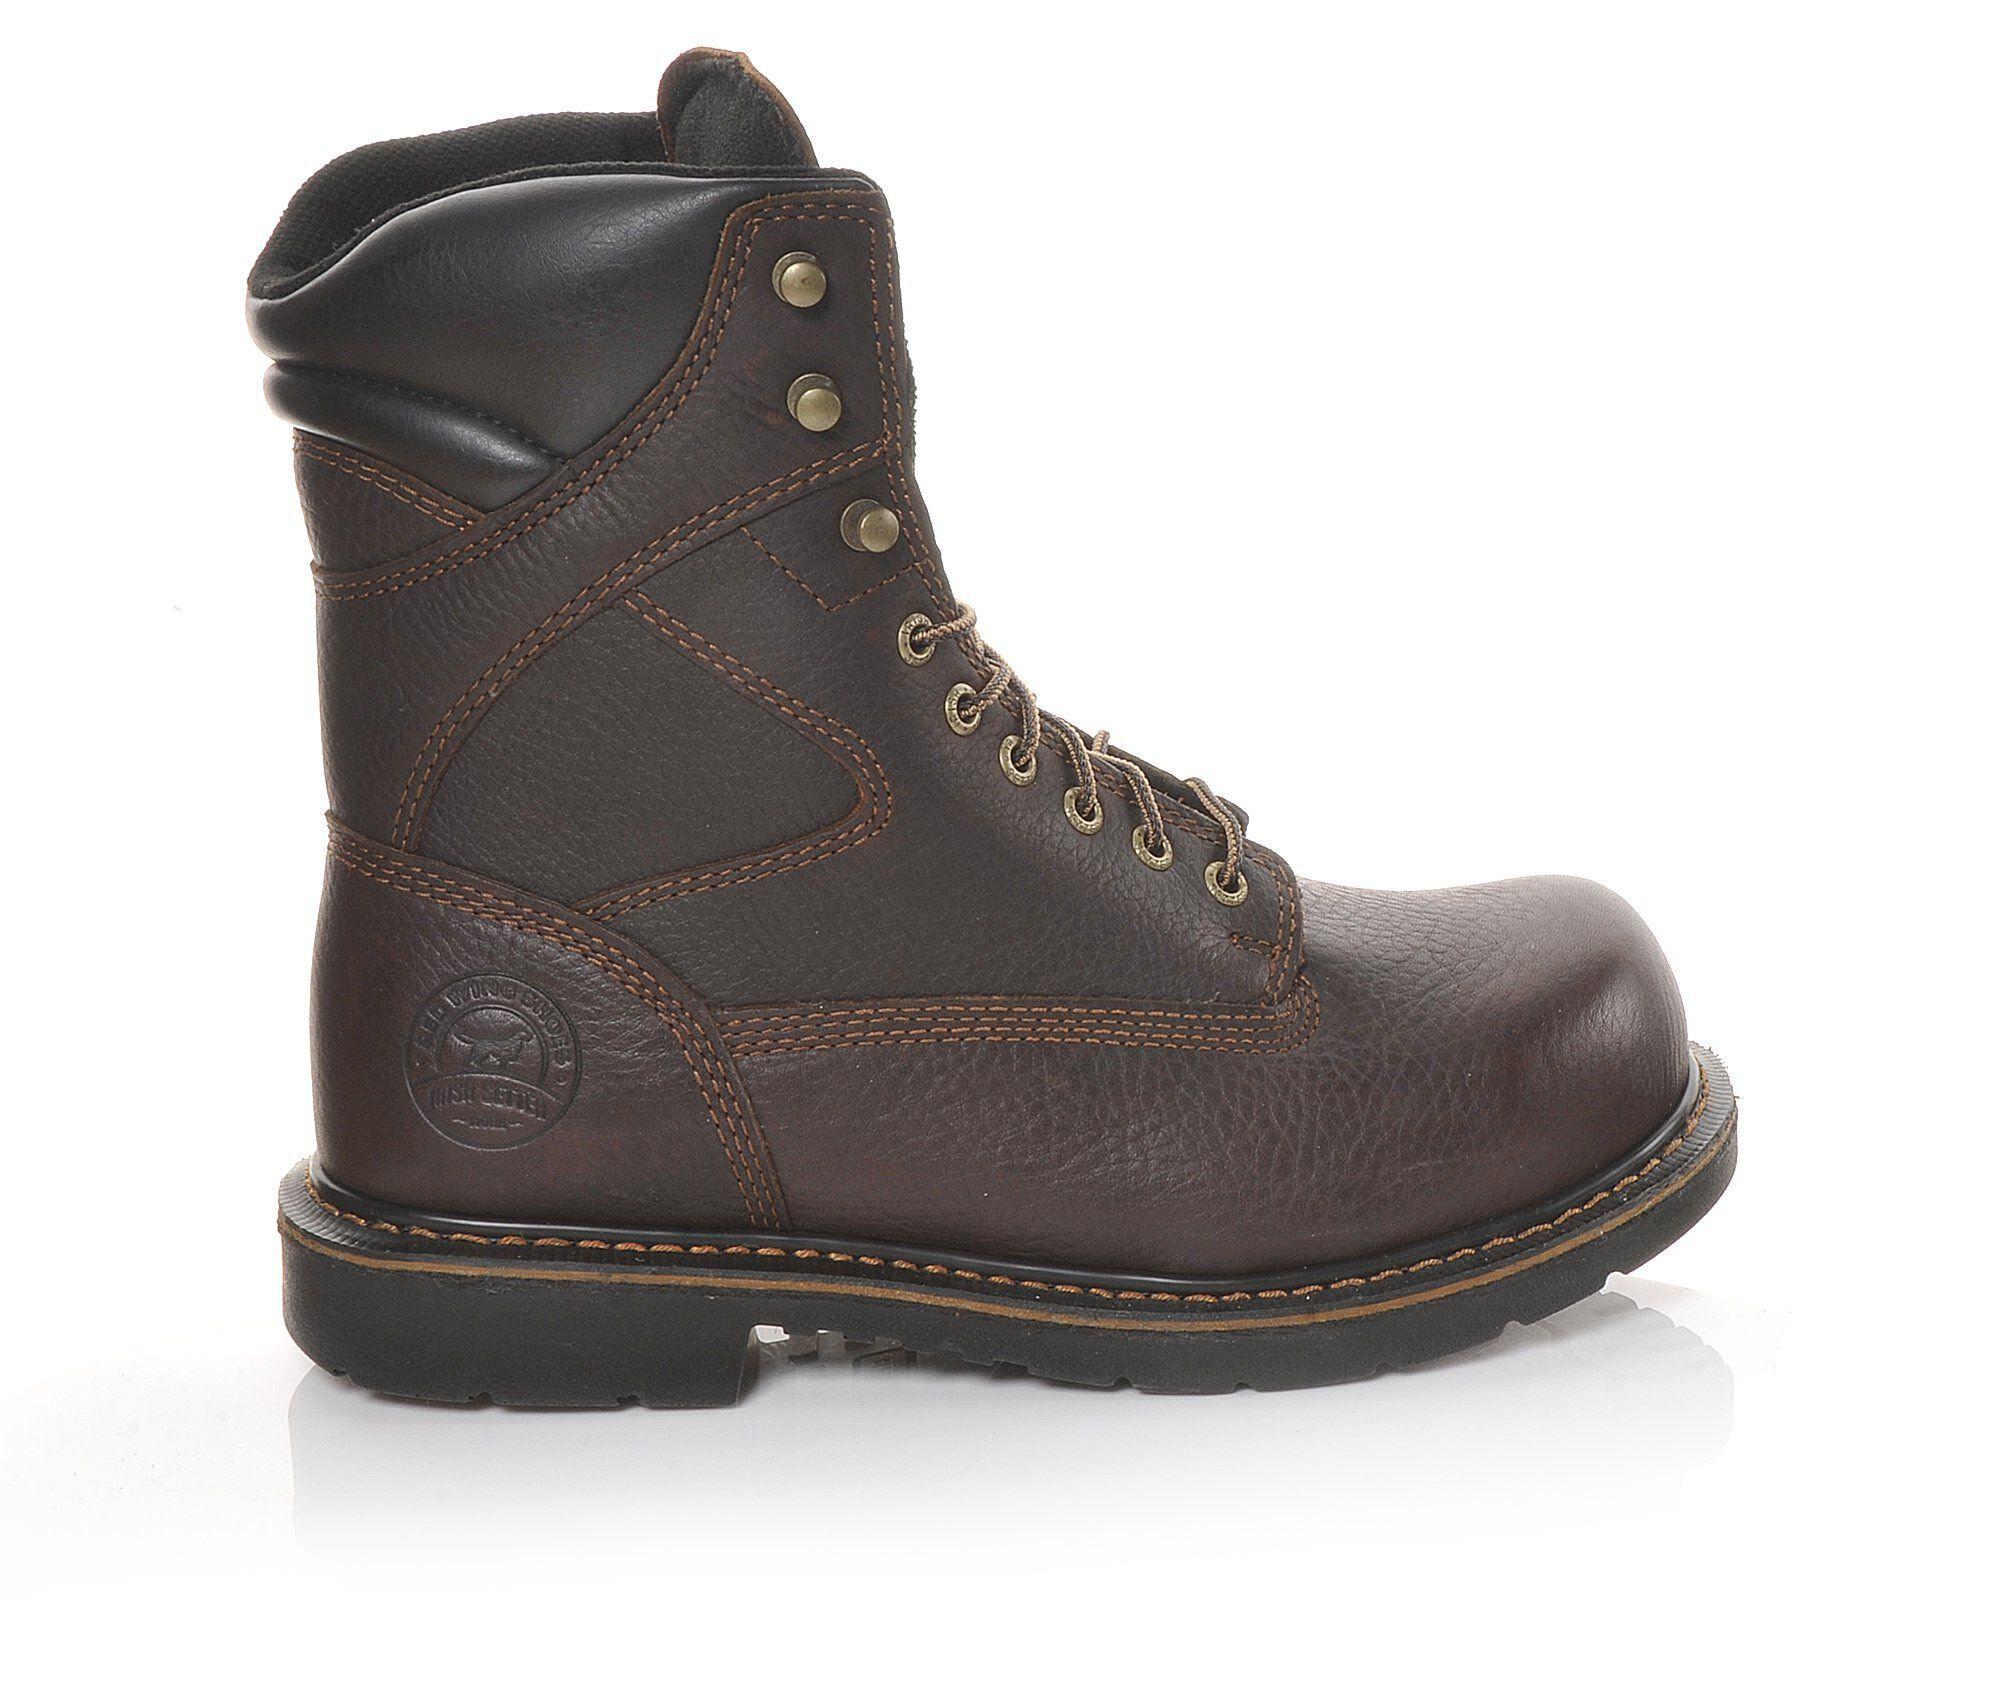 Men's Red Wing-Irish Setter 83824 King Toe 8 Inch Steel Toe Work Boots Brown